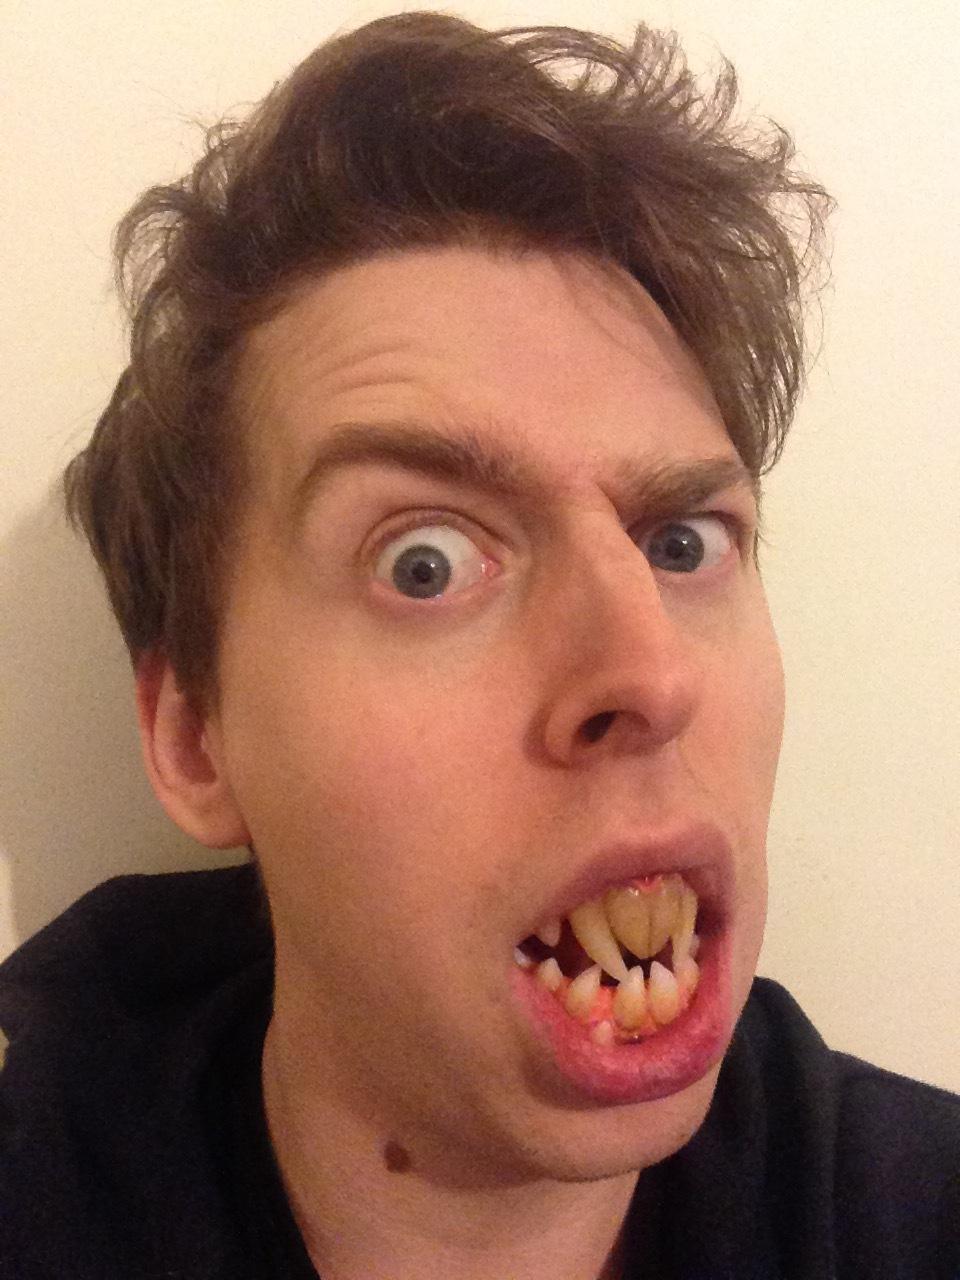 demonic teeth included